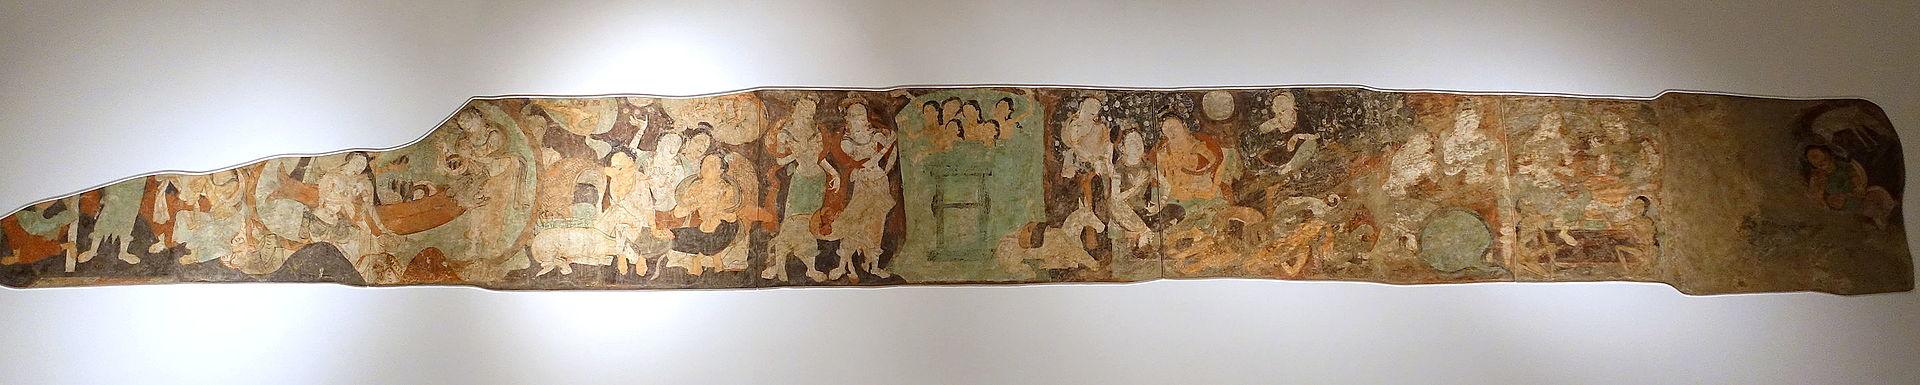 6-7The_Sronakotikarna_Legend,_Kizil,_Cave_of_the_Seafarers_(Cave_212),_561-637_AD,_.JPG